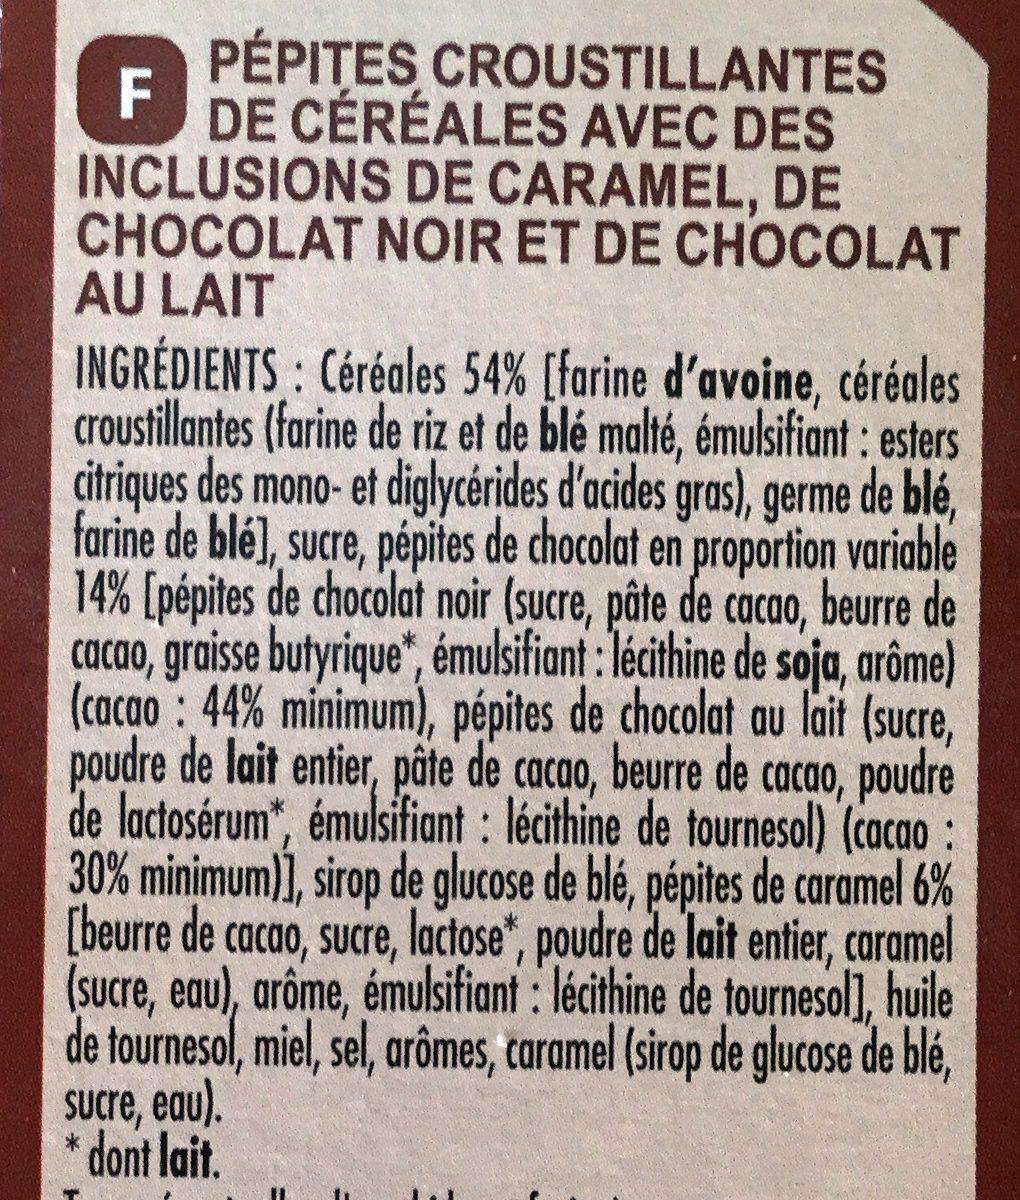 Crisp Muesli 2 Chocolats et Caramel - Ingrédients - fr